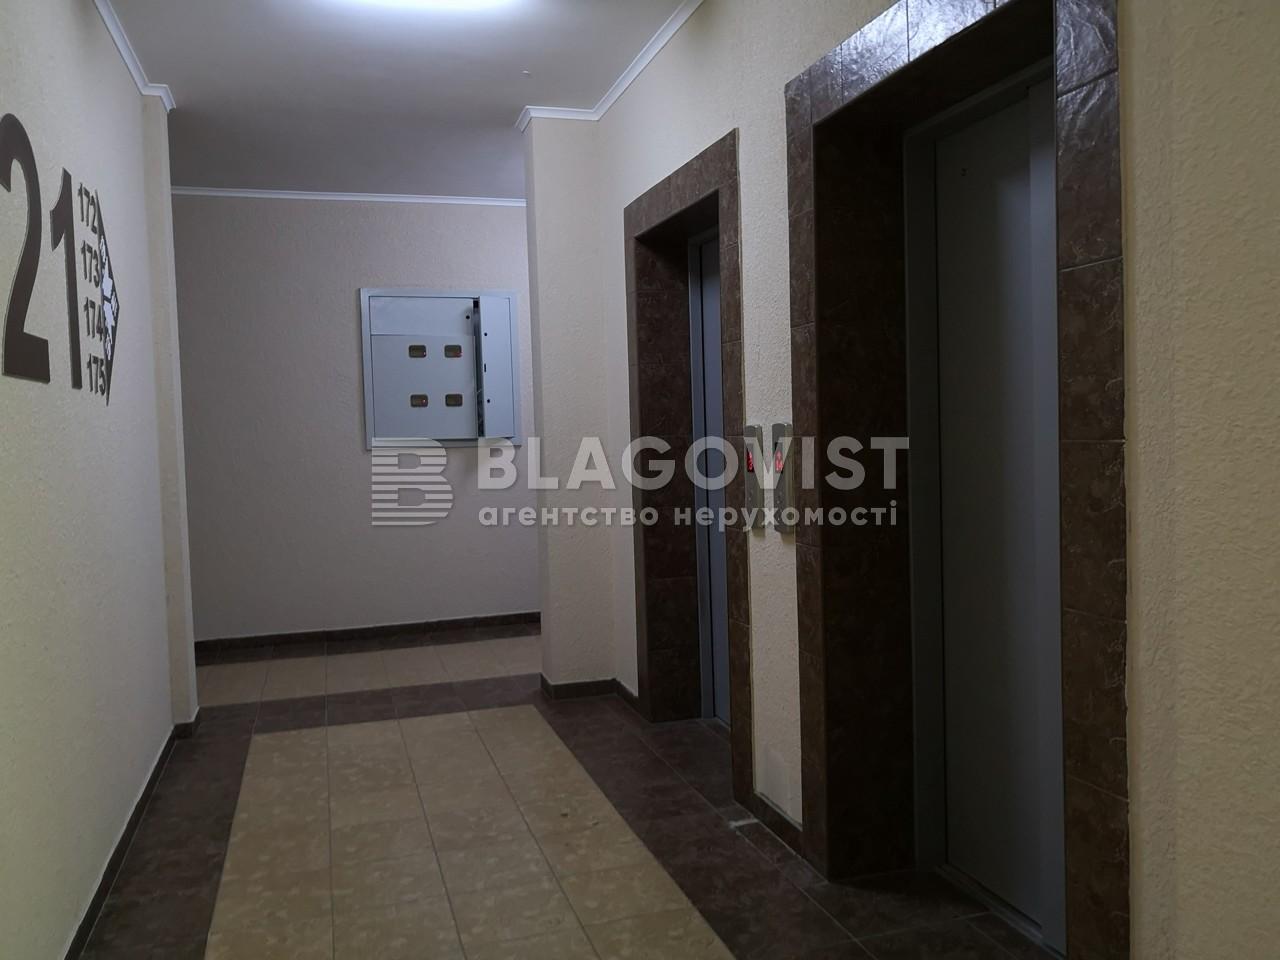 Квартира R-38685, Пожарского, 4, Киев - Фото 5